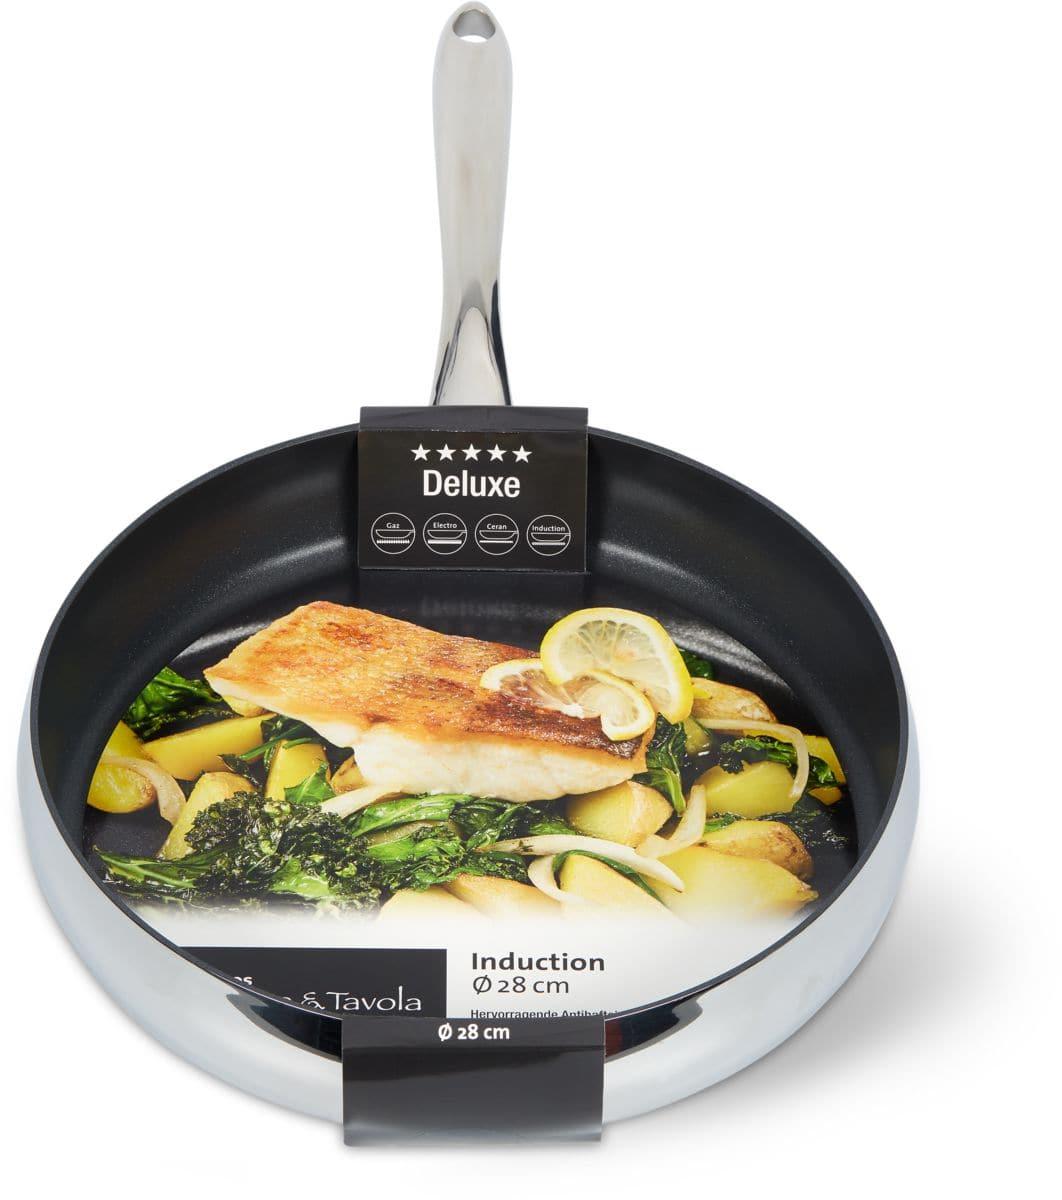 Cucina & Tavola DELUXE Bratpfanne 28cm flat